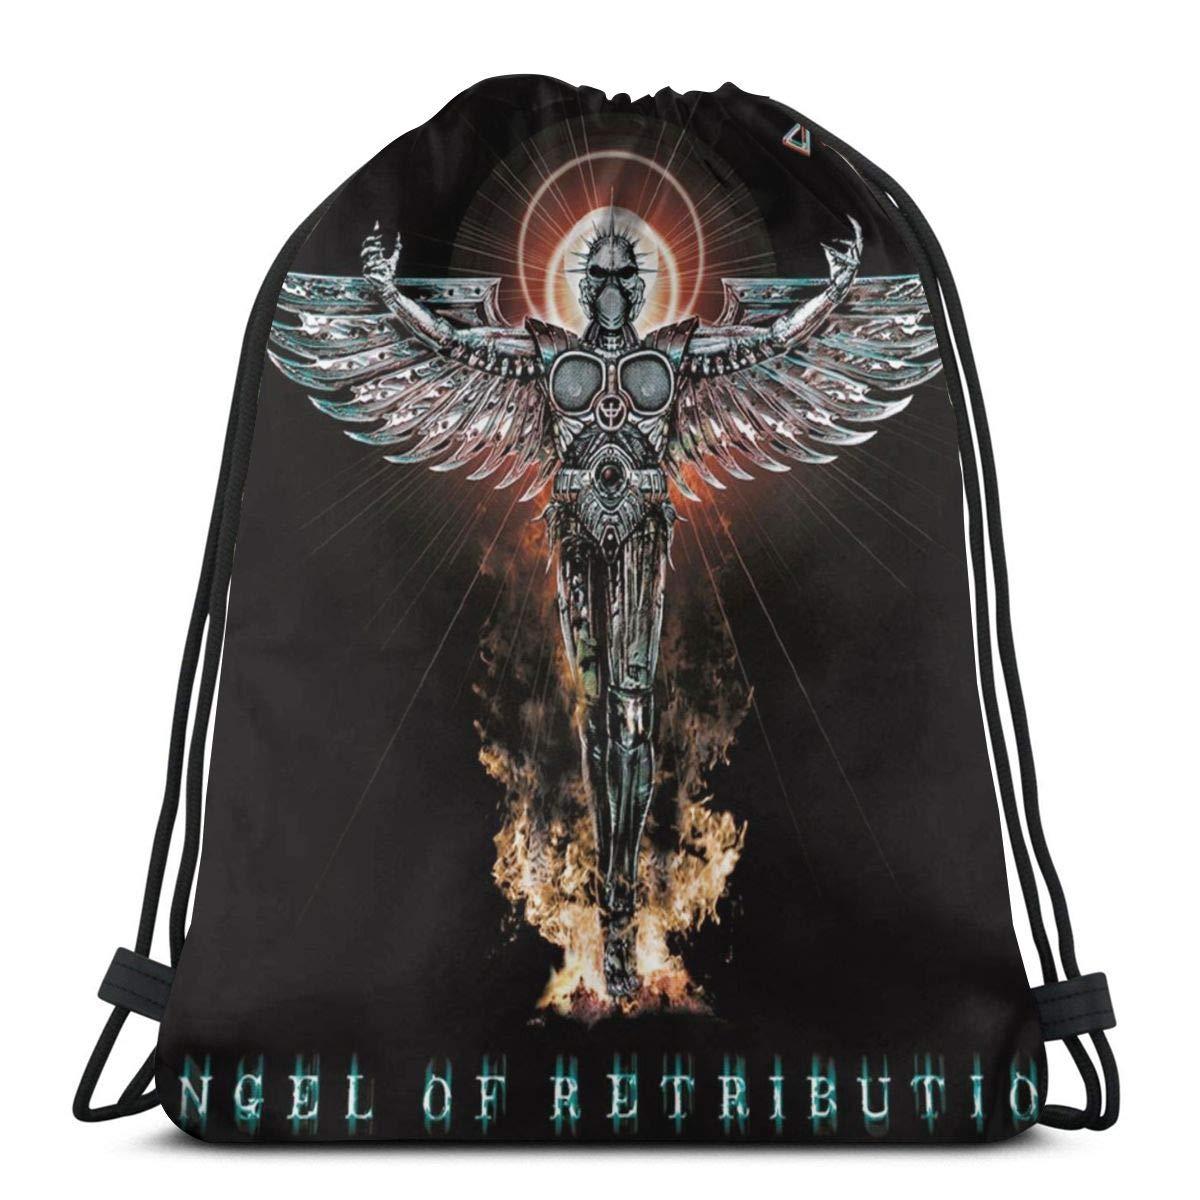 MFINOTshirt Judas Angel Retribution Priest Drawstring Bag Saca La Mochila Cuerda Unisex con Bolsas Zapatos para Deporte Gimnasio Senderismo Bicicleta Nadar